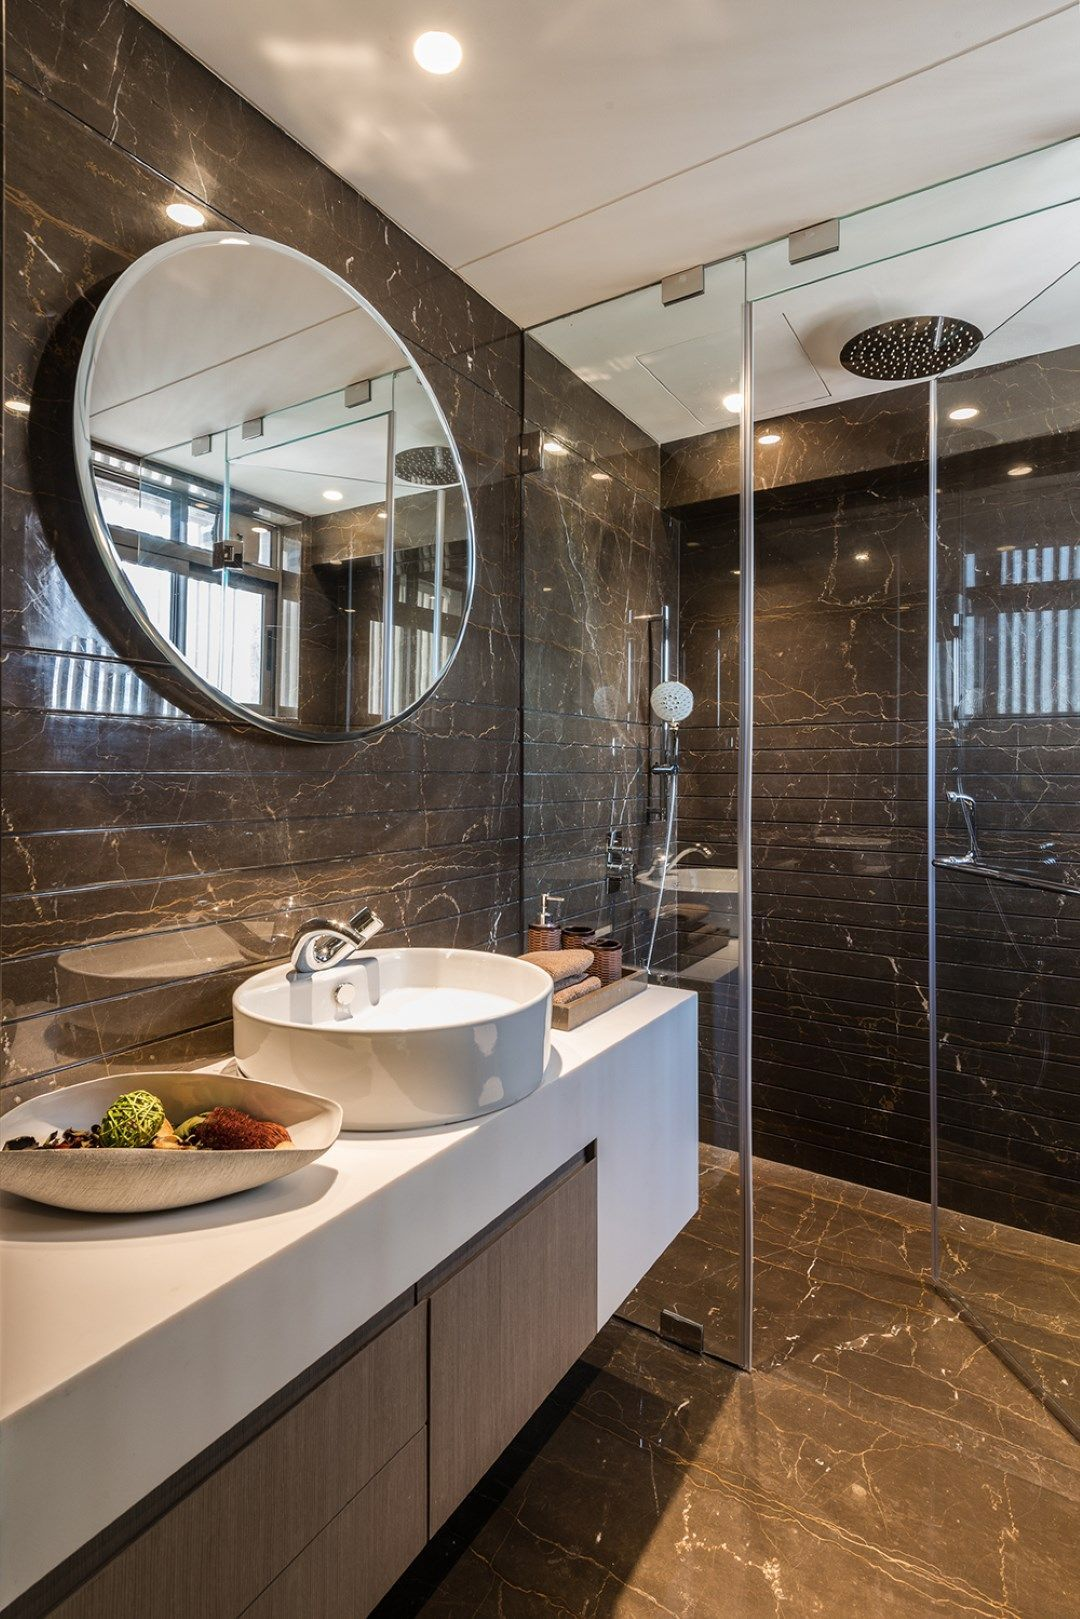 Simple Yet Luxurious Home Interiors Adda Architects The Architects Diary Luxurytoiletaccessories Bathroom Design Inspiration Modern Bathroom Design Luxury Toilet